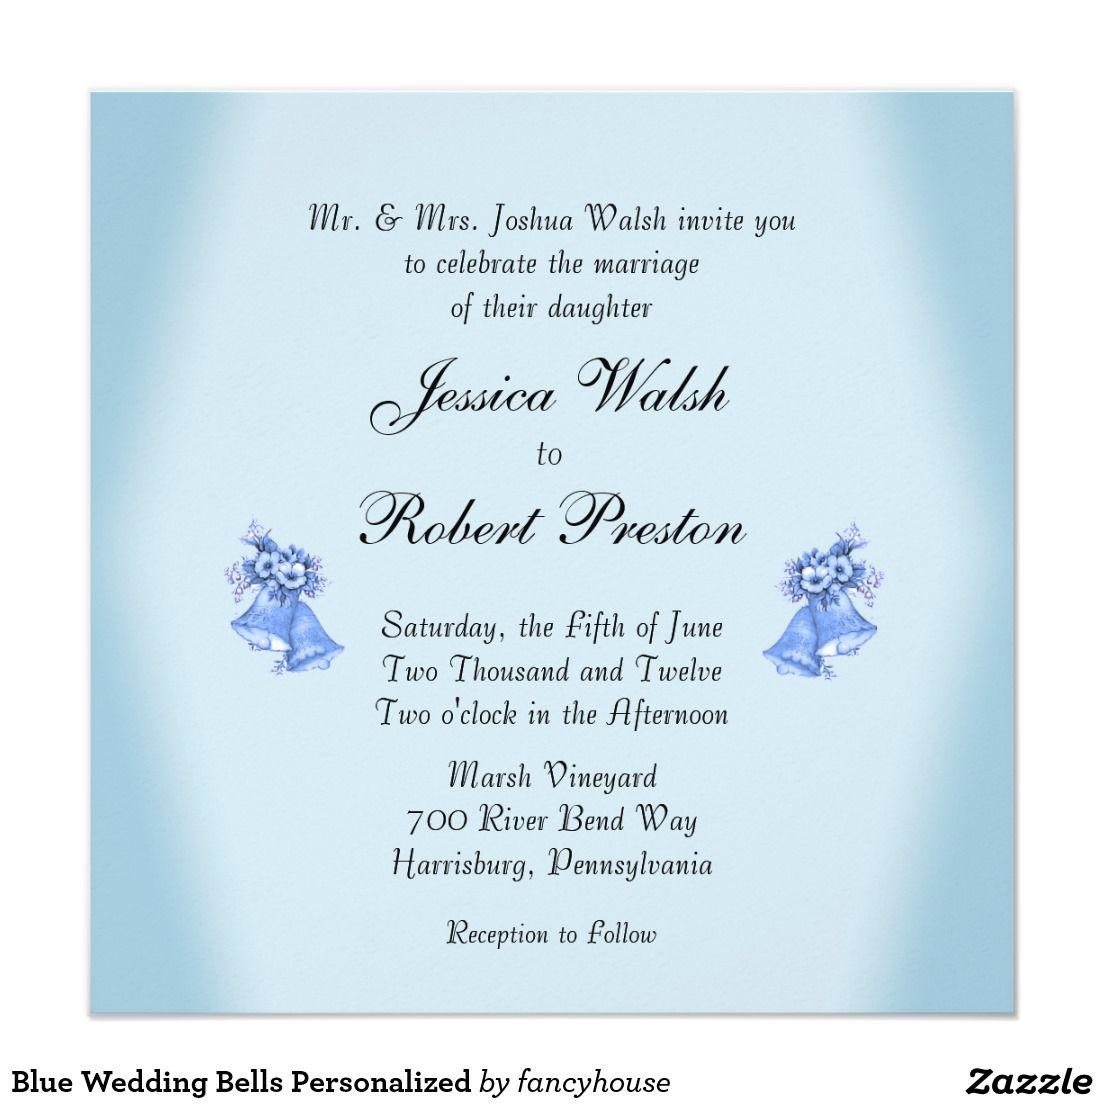 Blue wedding bells invitation pinterest wedding bells weddings blue wedding bells personalized invitation stopboris Images